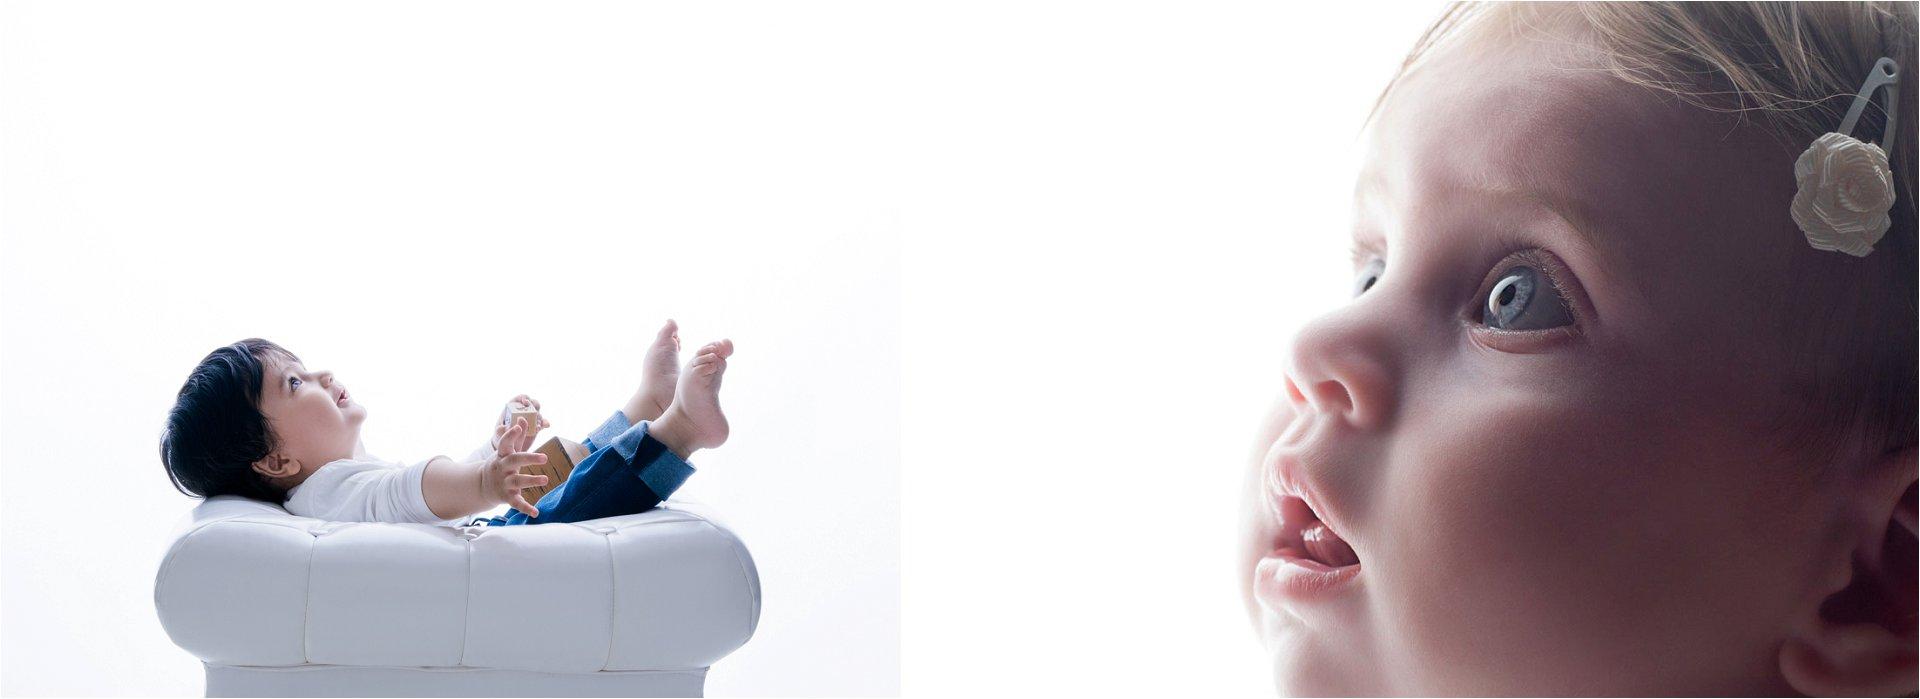 baby-photographer-West-London.jpg